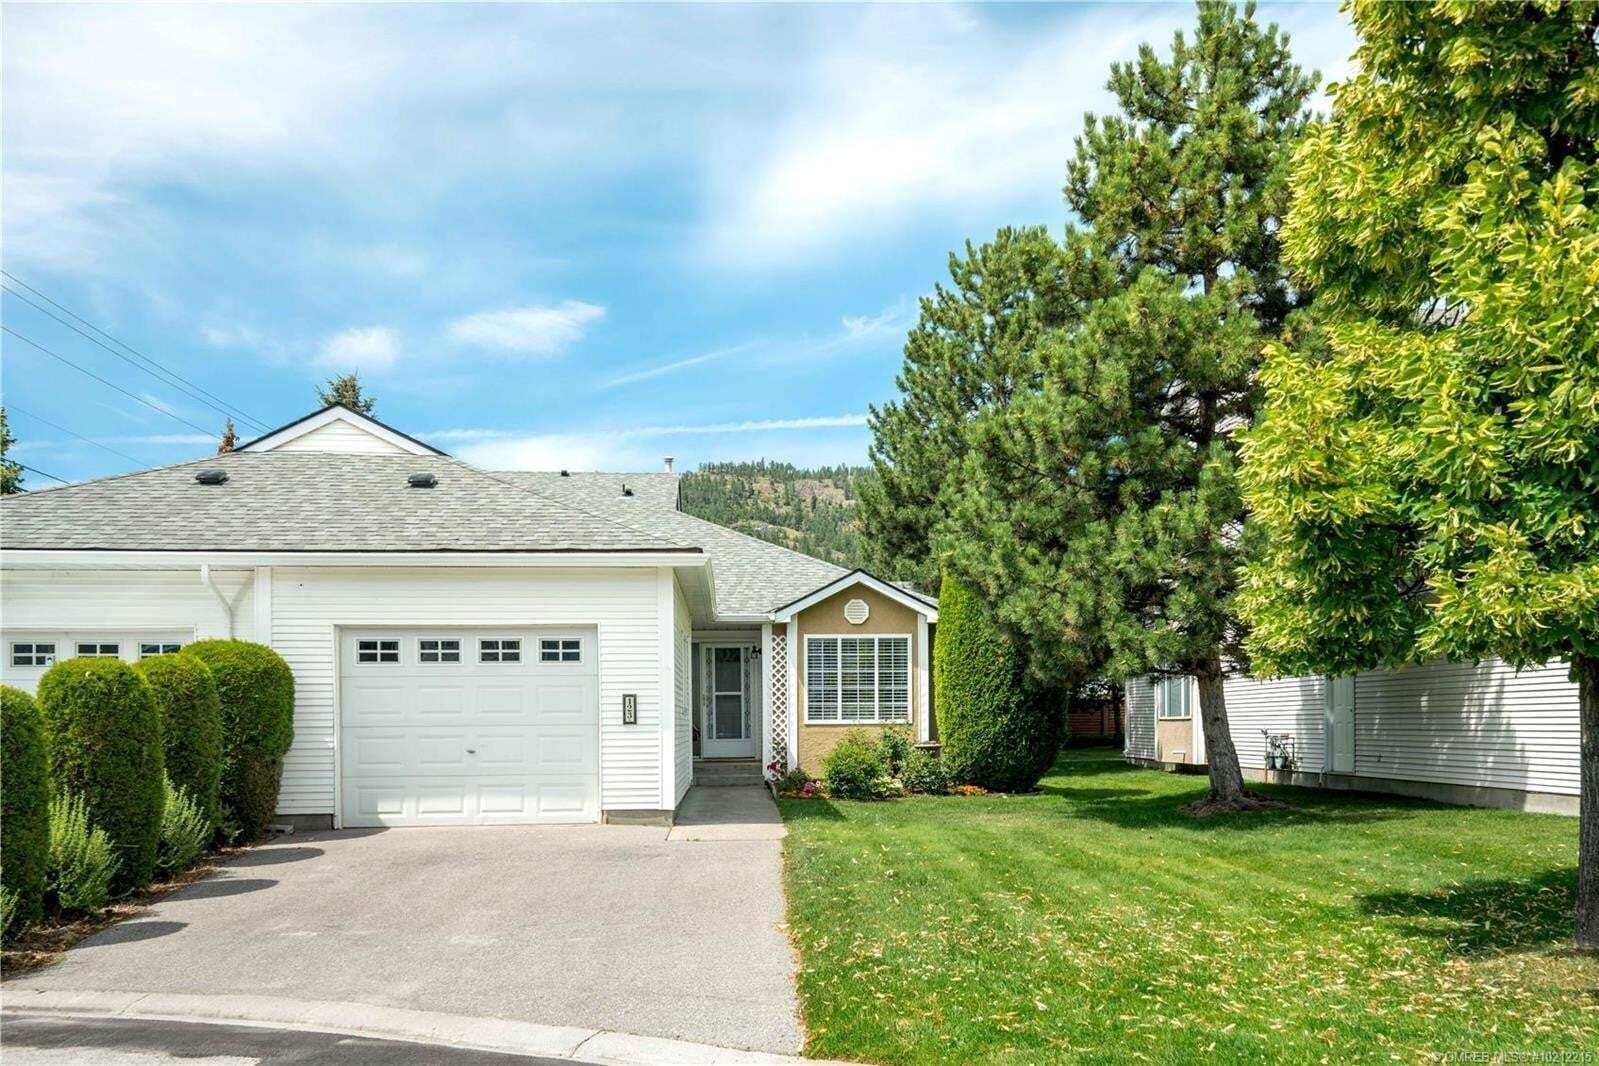 Townhouse for sale at 160 Celano Cres Kelowna British Columbia - MLS: 10212215